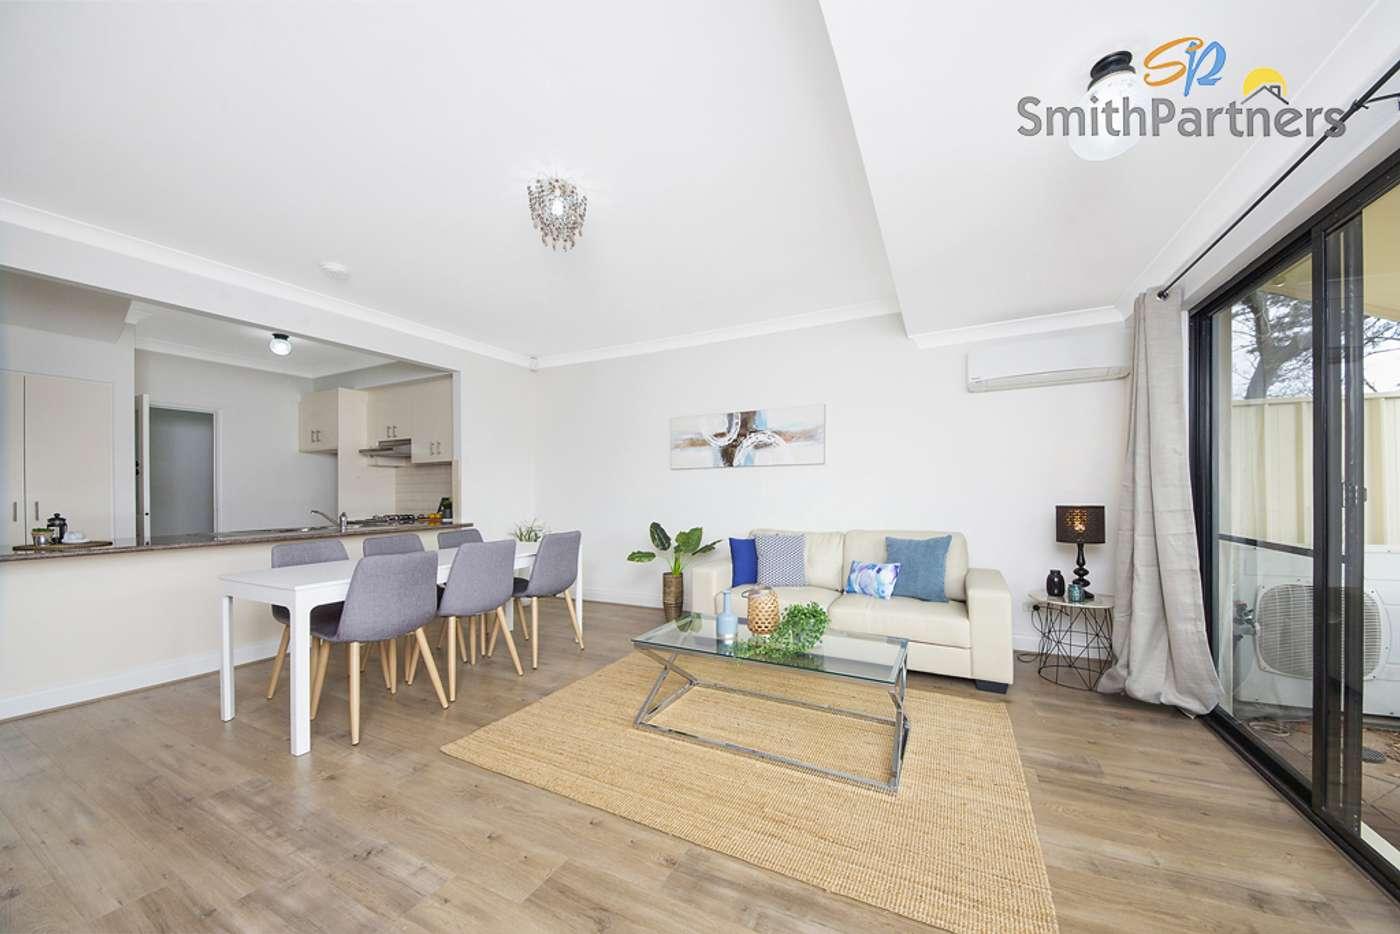 Sixth view of Homely house listing, 148 Drayton Street, Bowden SA 5007